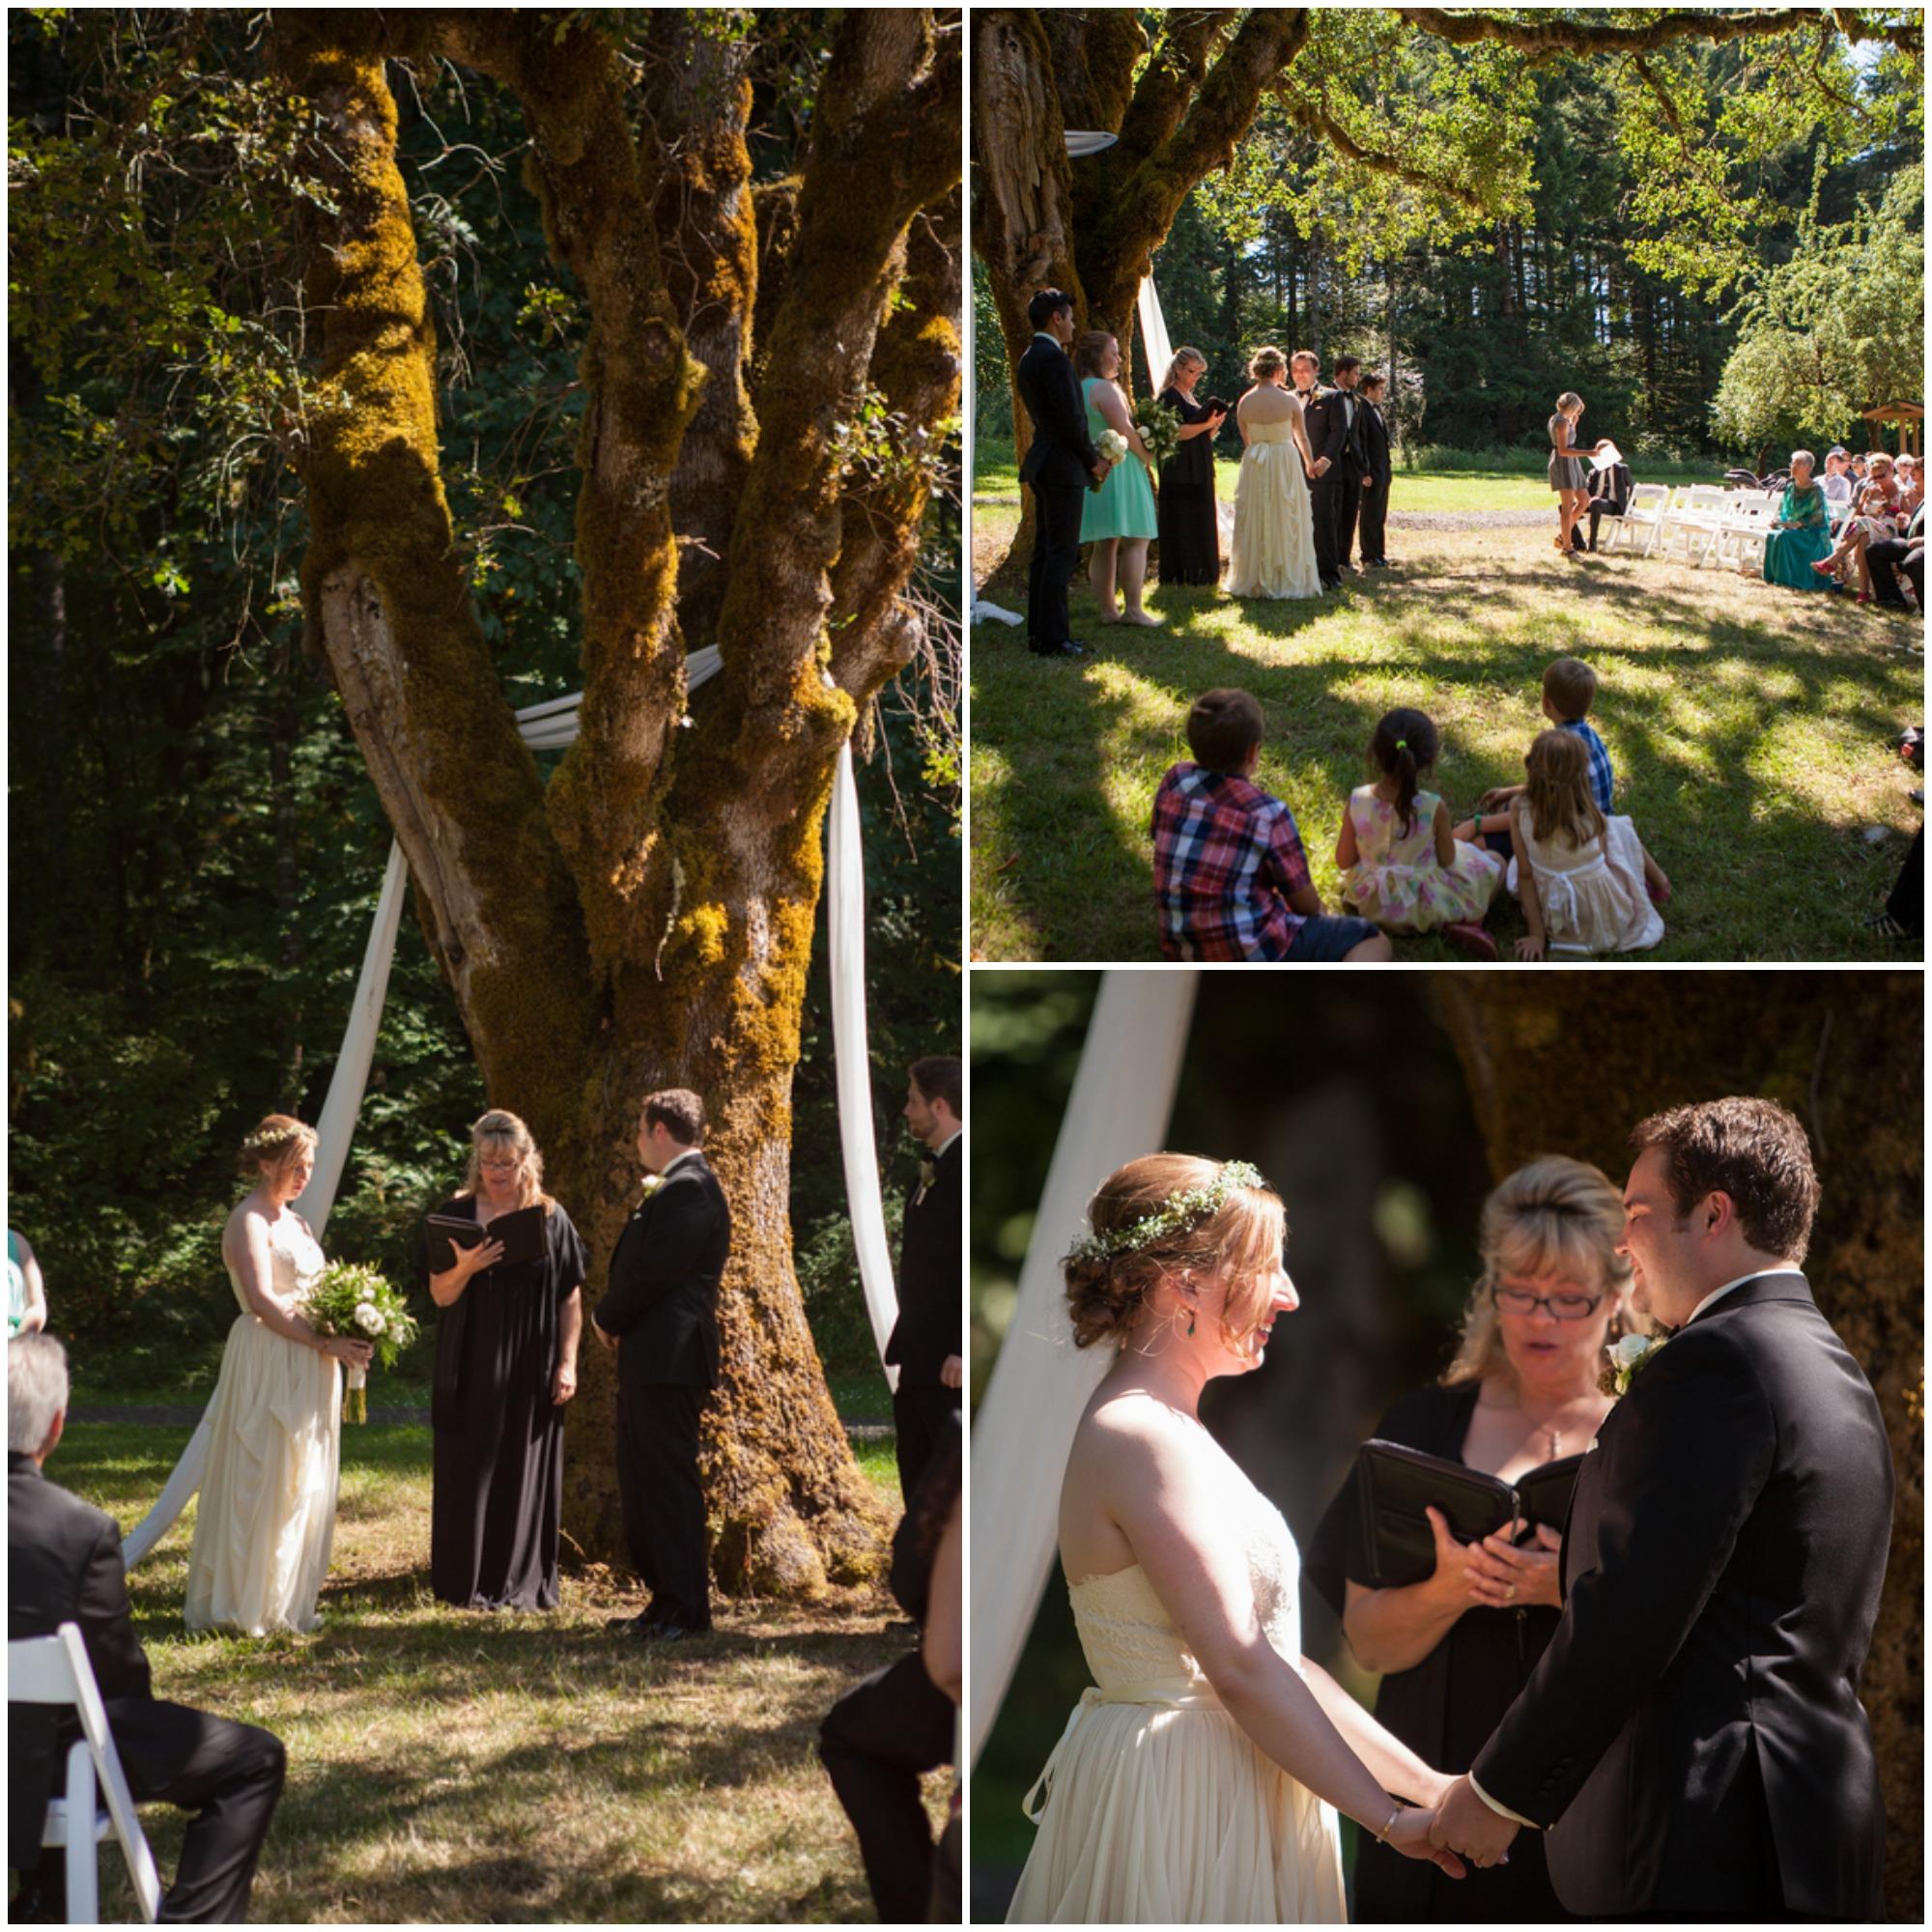 Outdoor Woodland Small Wedding Rustic Wedding Chic